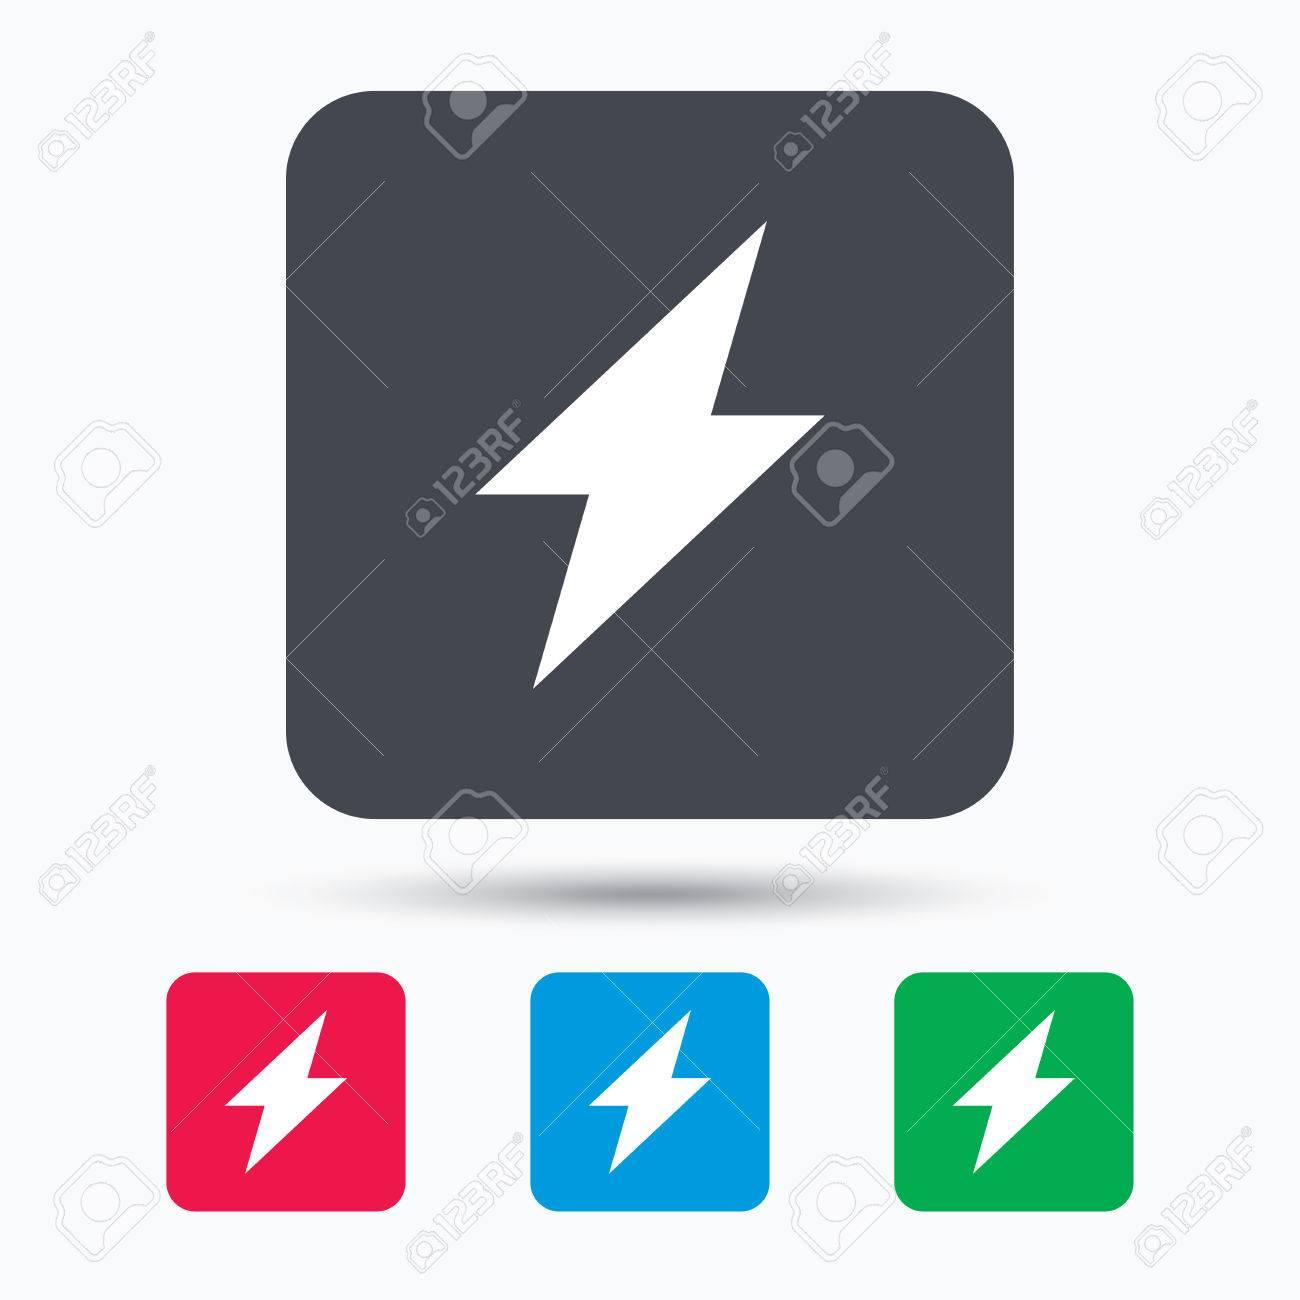 Berühmt Elektrische Hausverkabelungssymbole Galerie ...